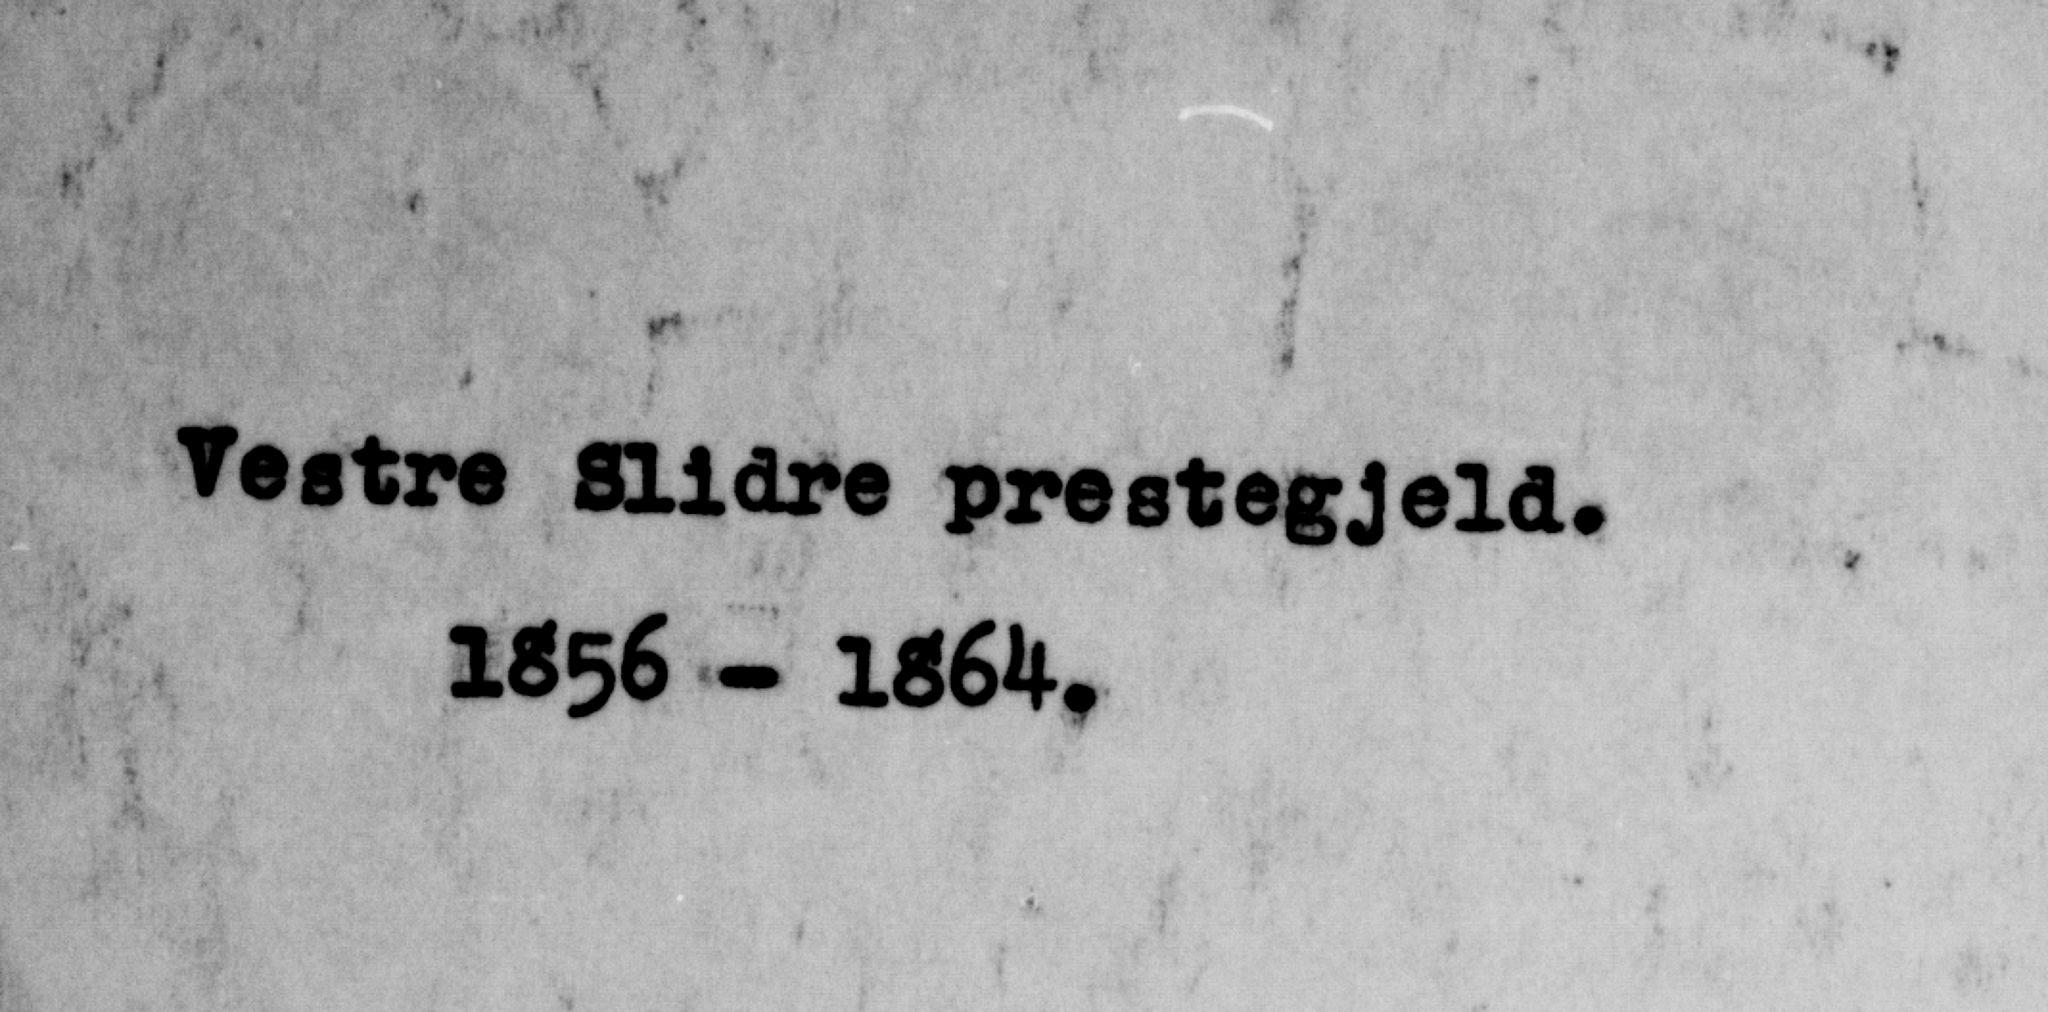 SAH, Vestre Slidre prestekontor, Ministerialbok nr. 2, 1856-1864